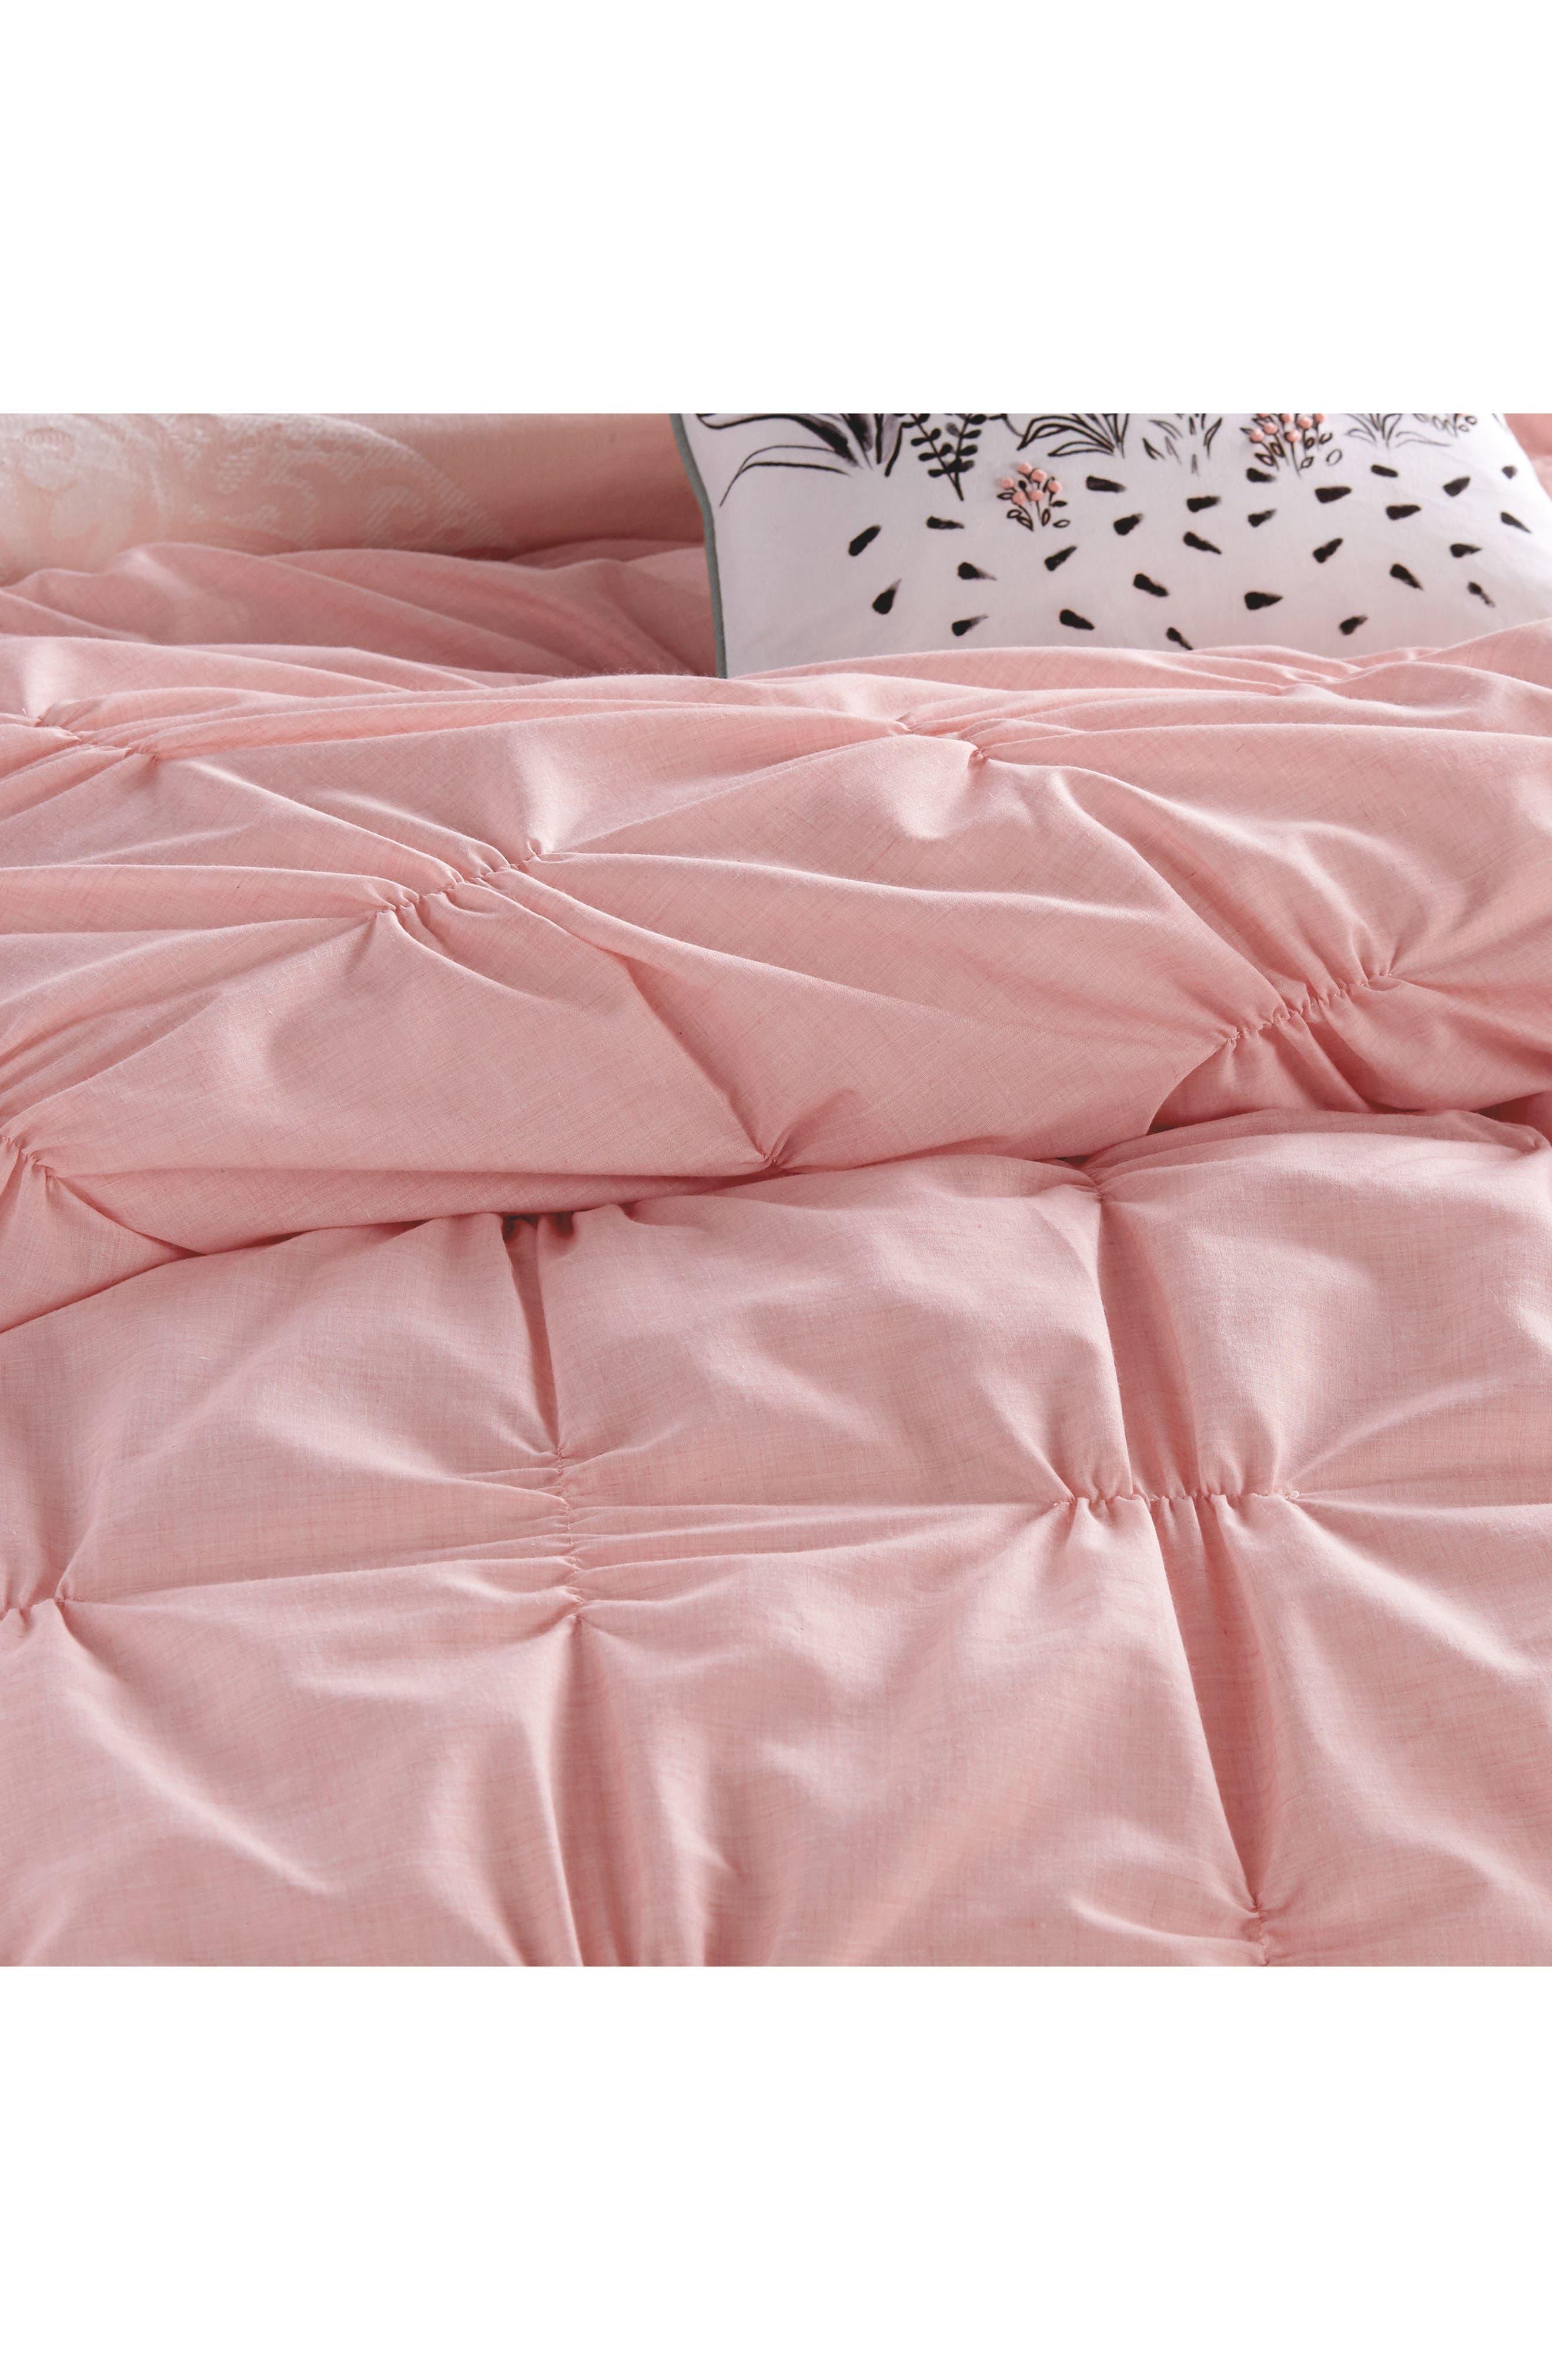 Check Smocked Comforter & Sham Set,                             Alternate thumbnail 3, color,                             Blush